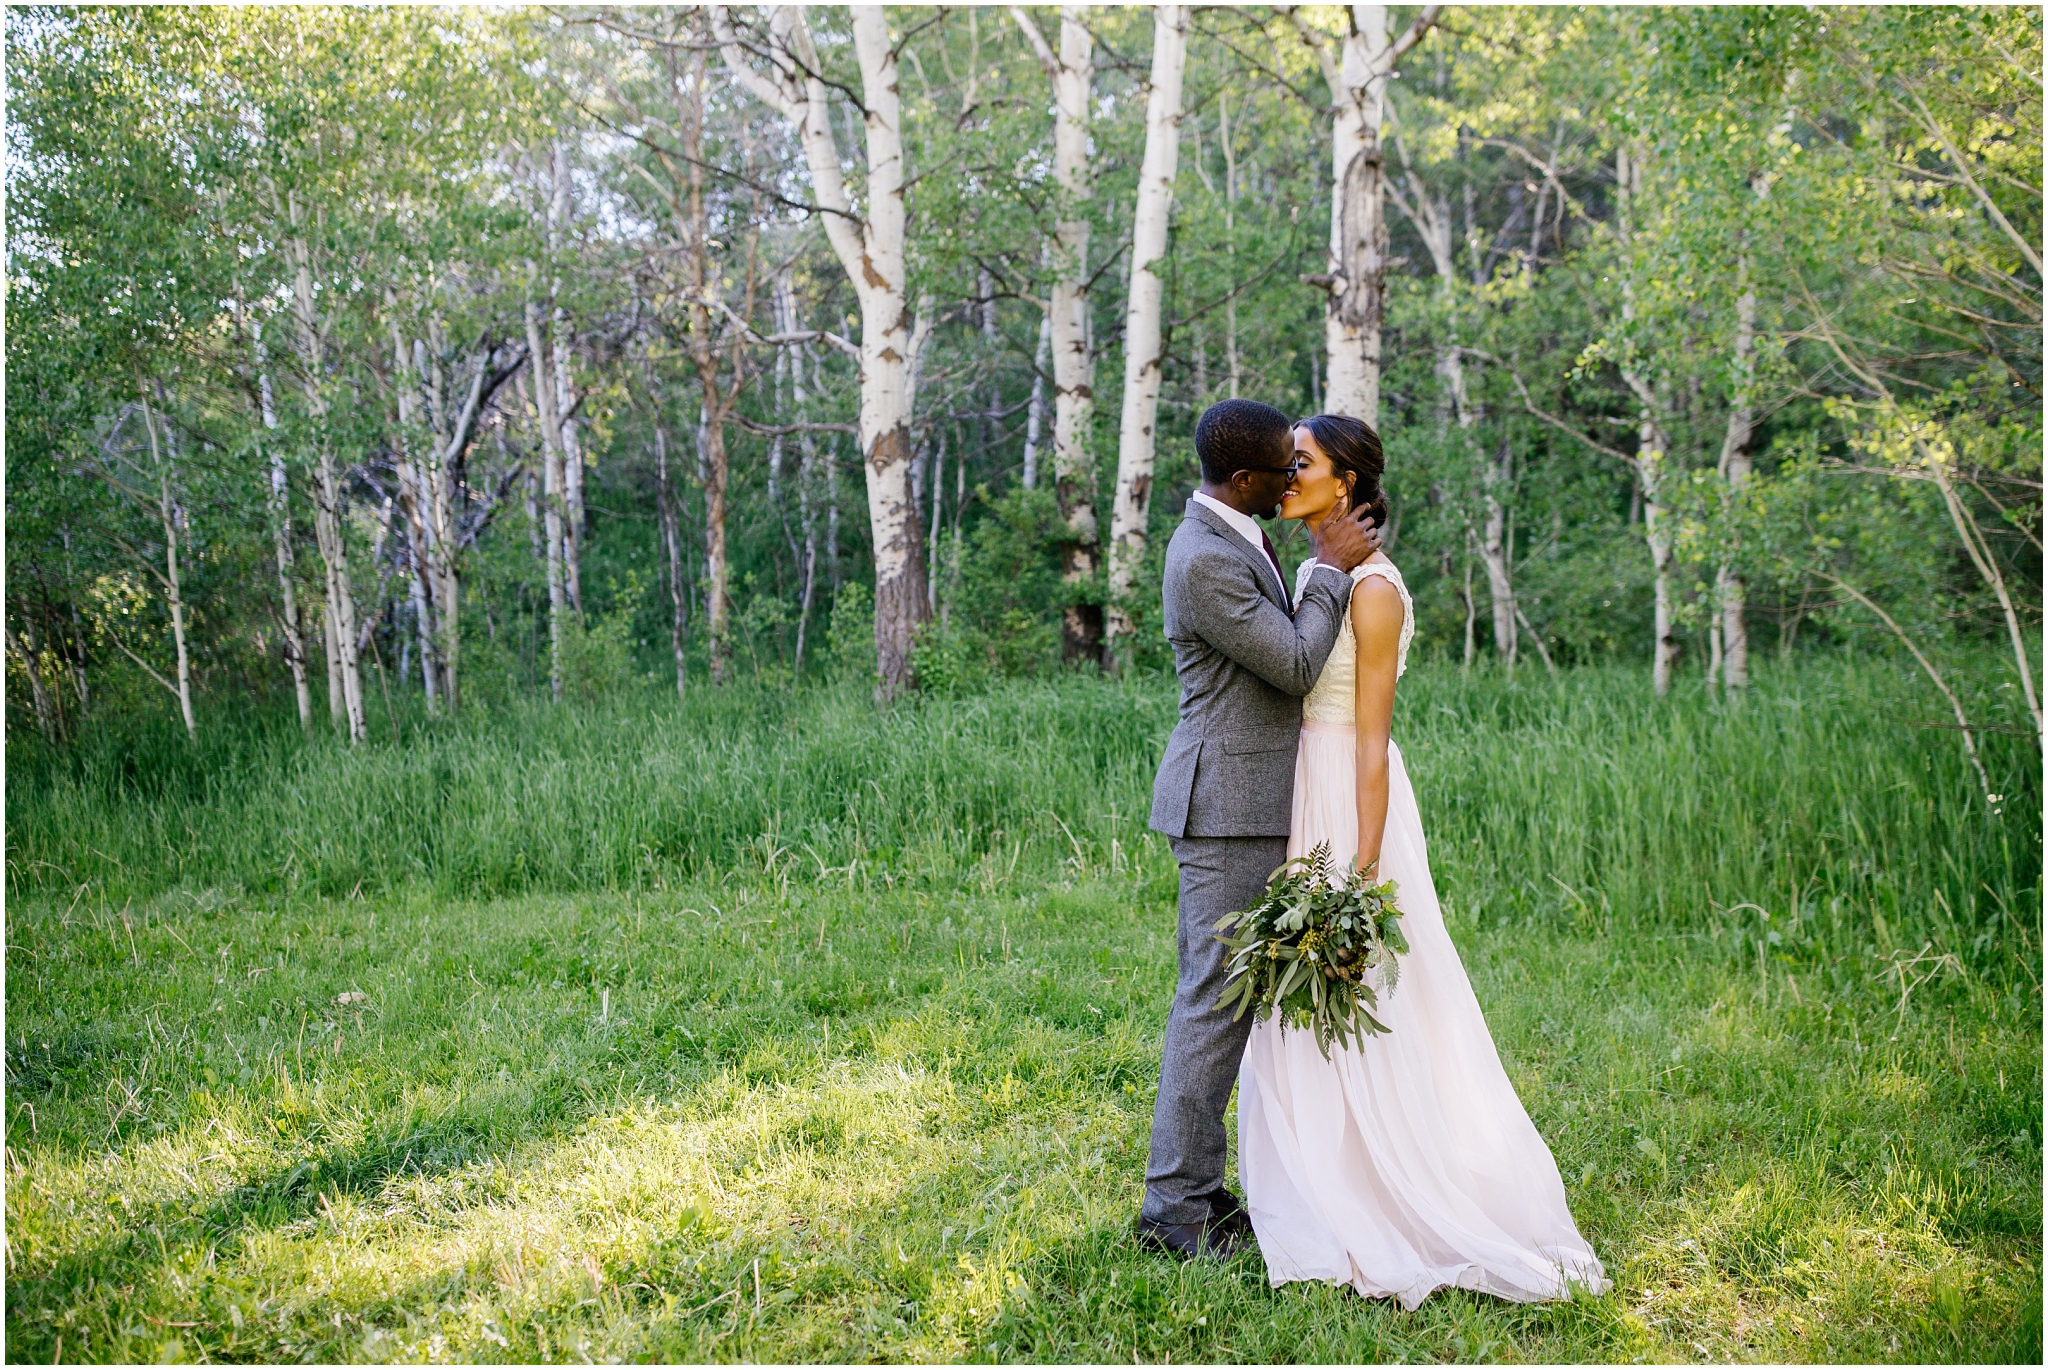 TreeHorseShoot-36_Lizzie-B-Imagery-Utah-Wedding-Photographer-Salt-Lake-City-Park-City-Oakley.jpg